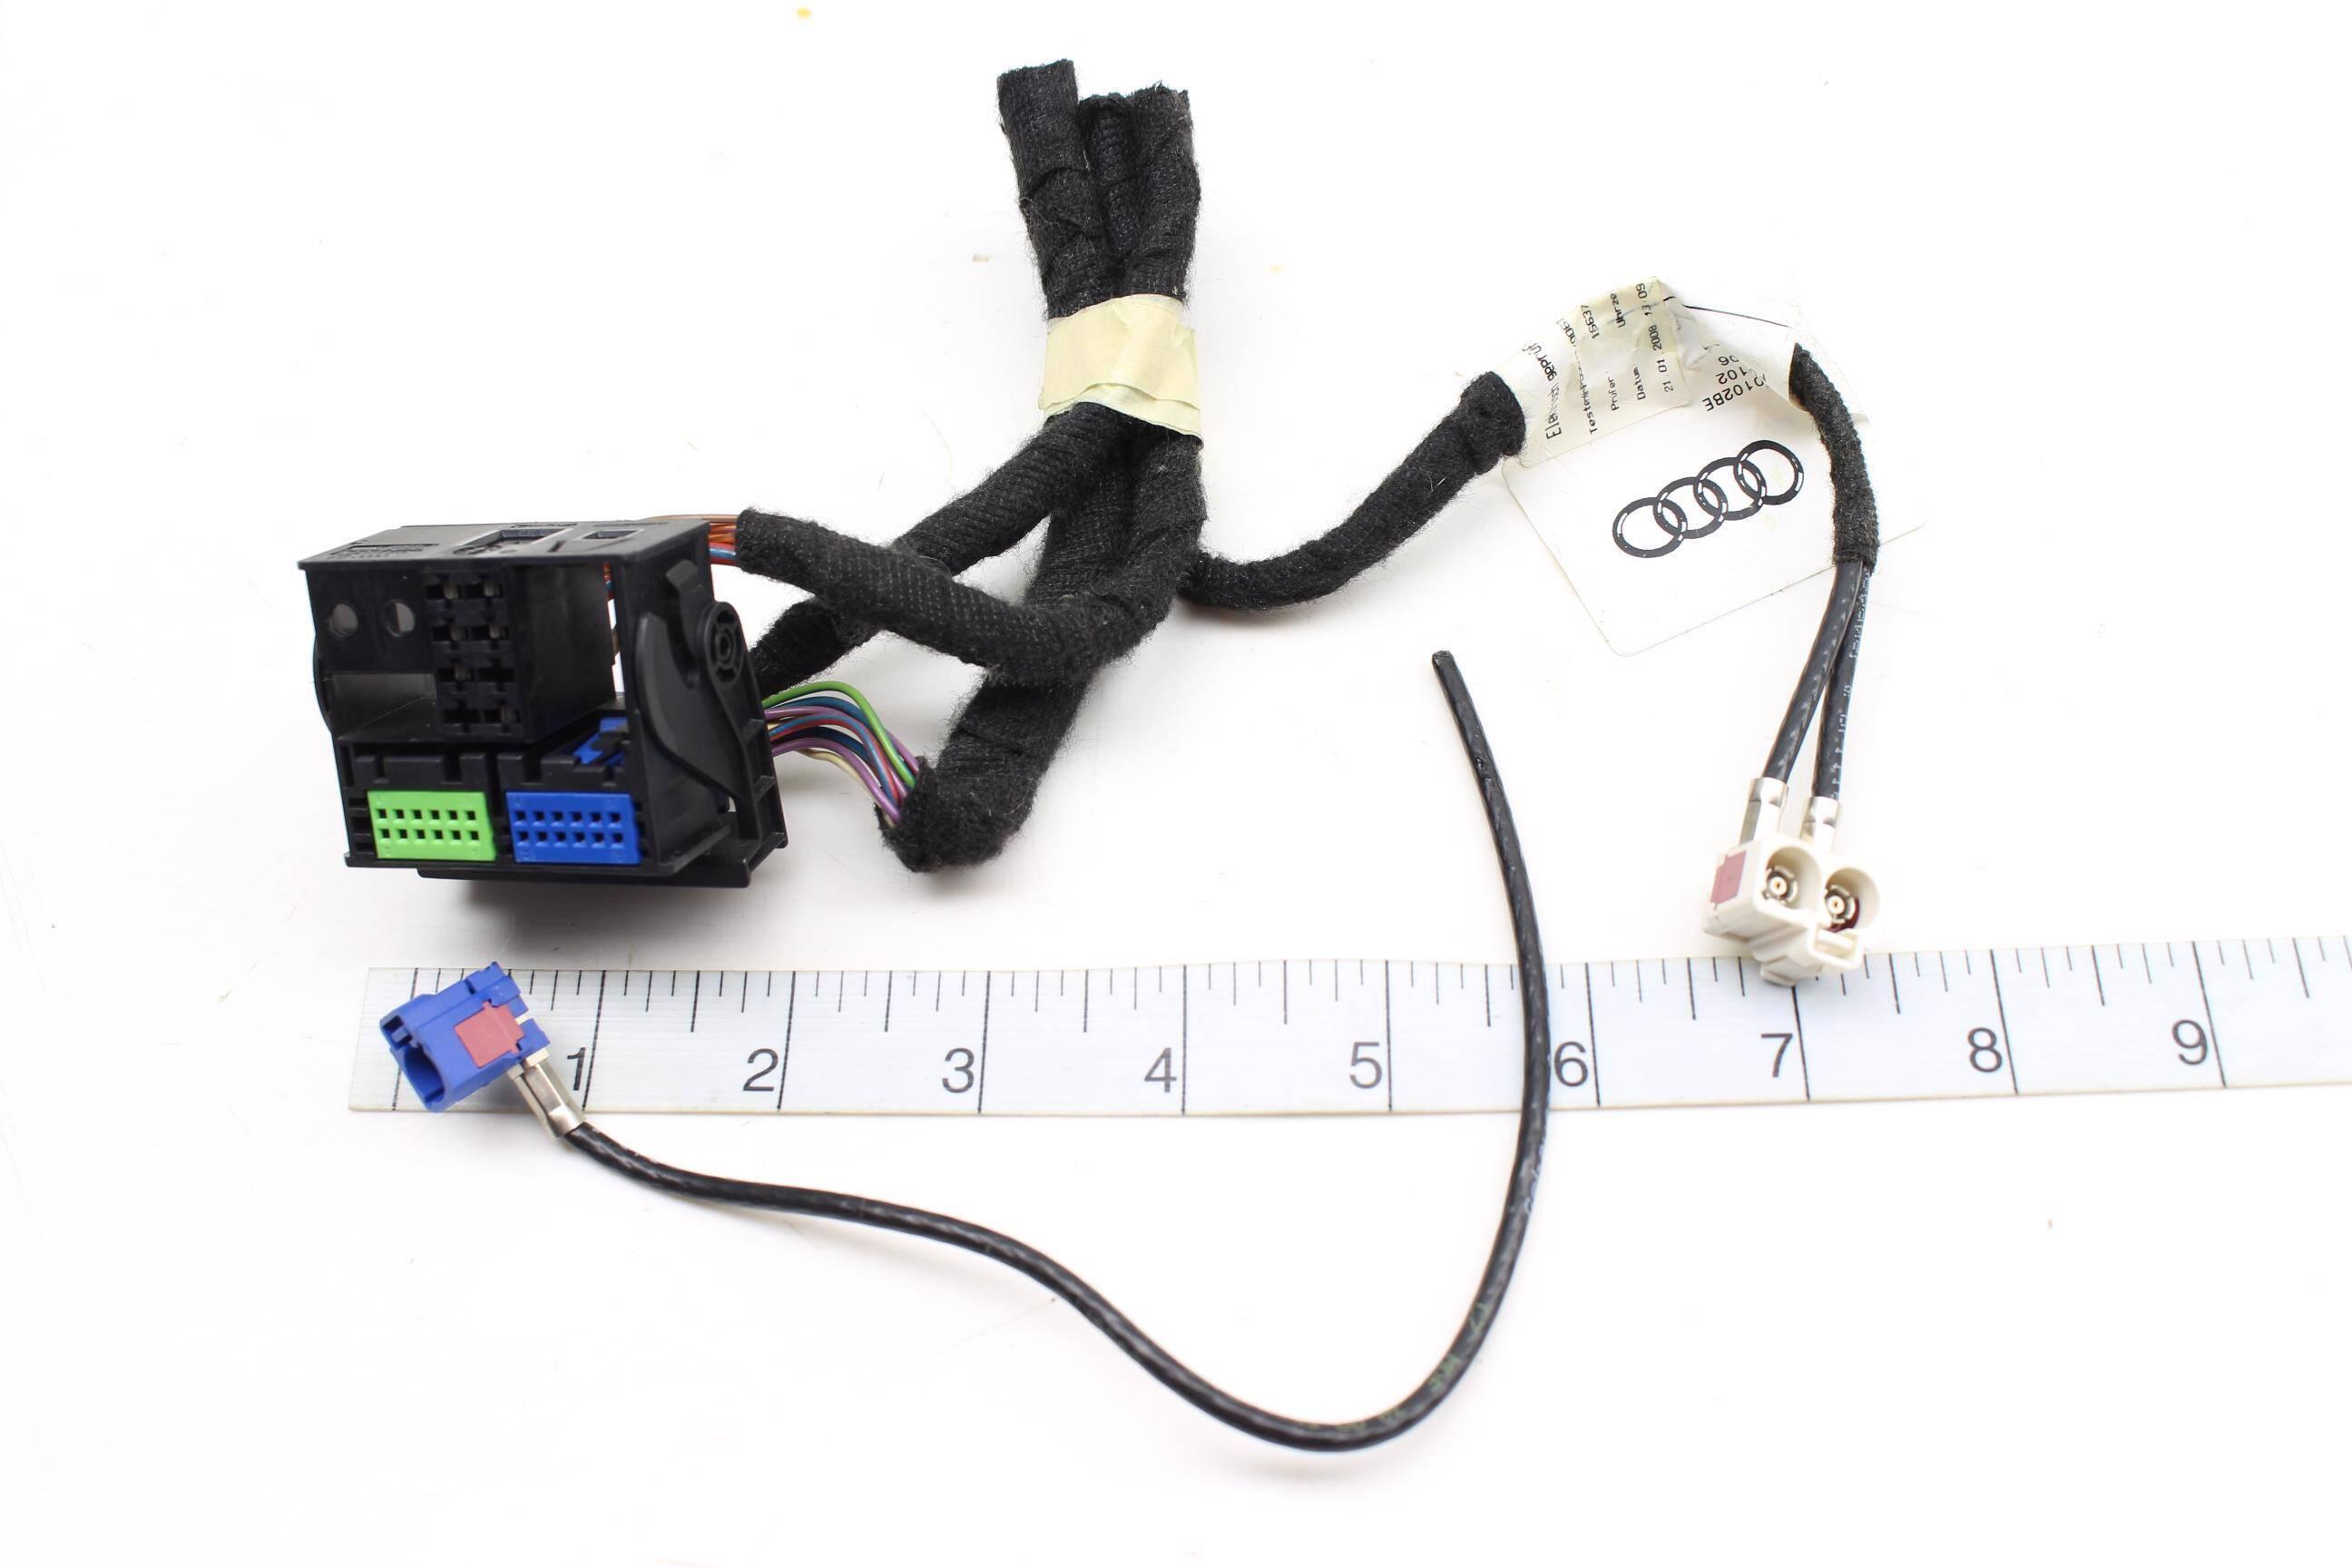 07 08 audi rs4 b7 - rnse / rns-e radio nav unit wiring harness / connector  set